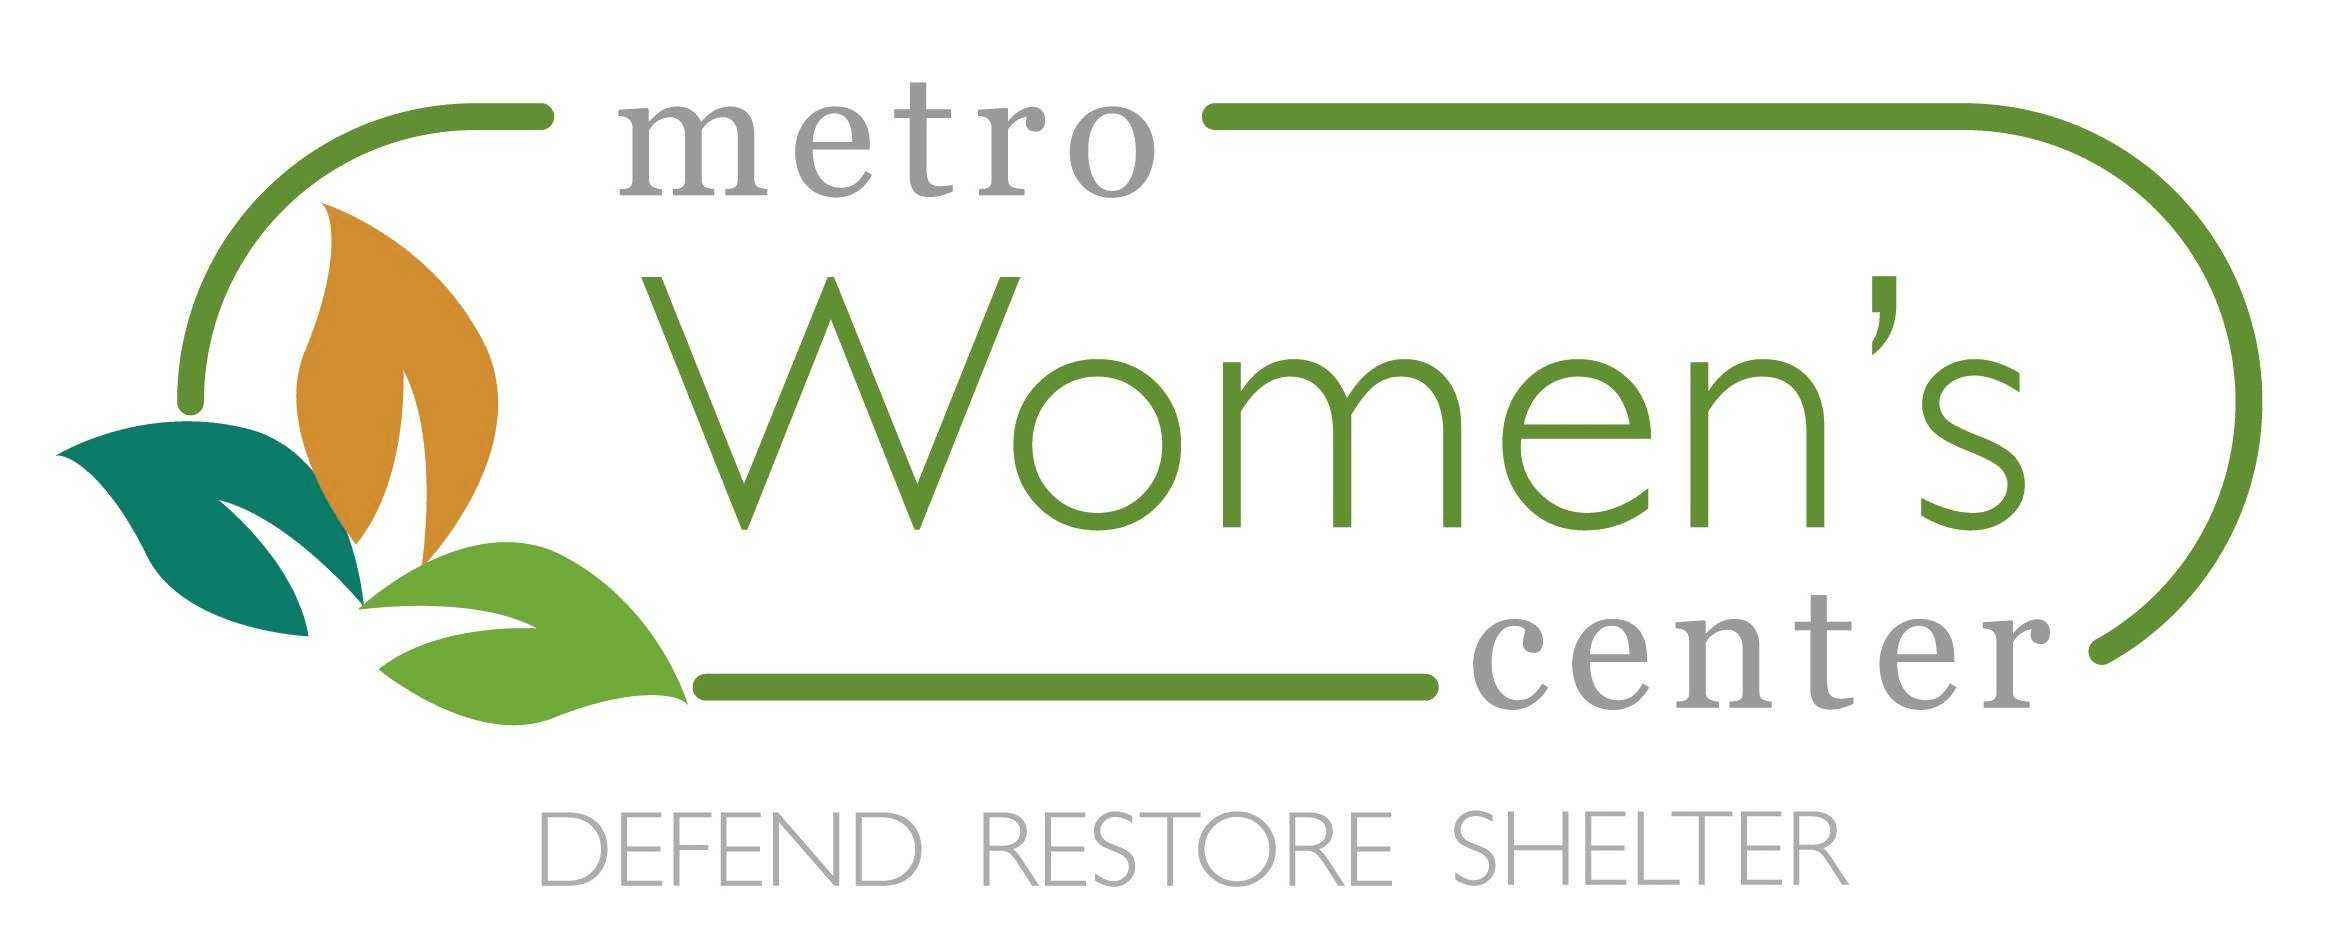 Metro Women's Center